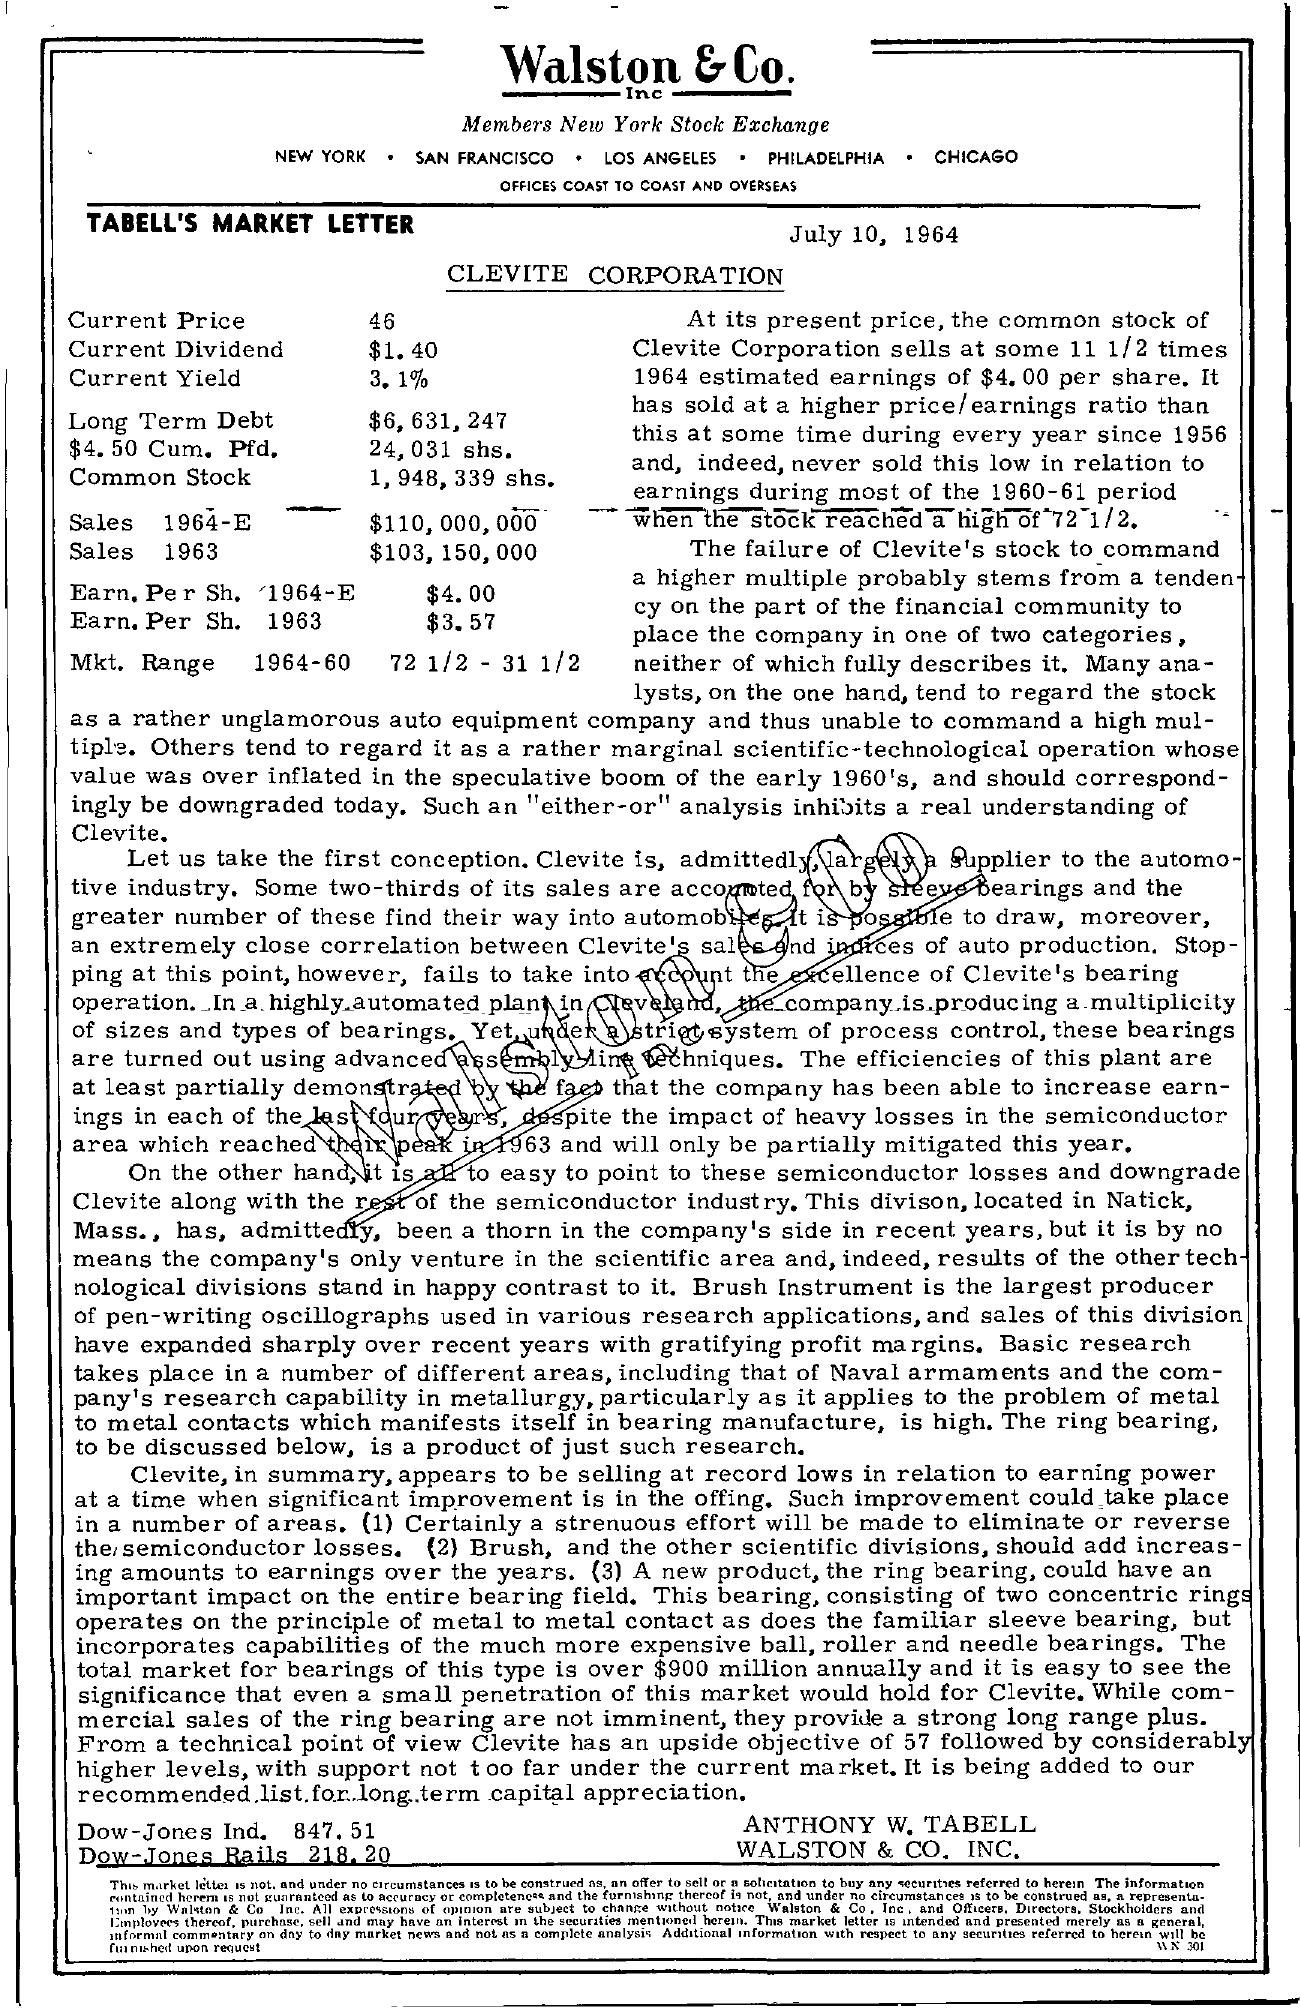 Tabell's Market Letter - July 10, 1964